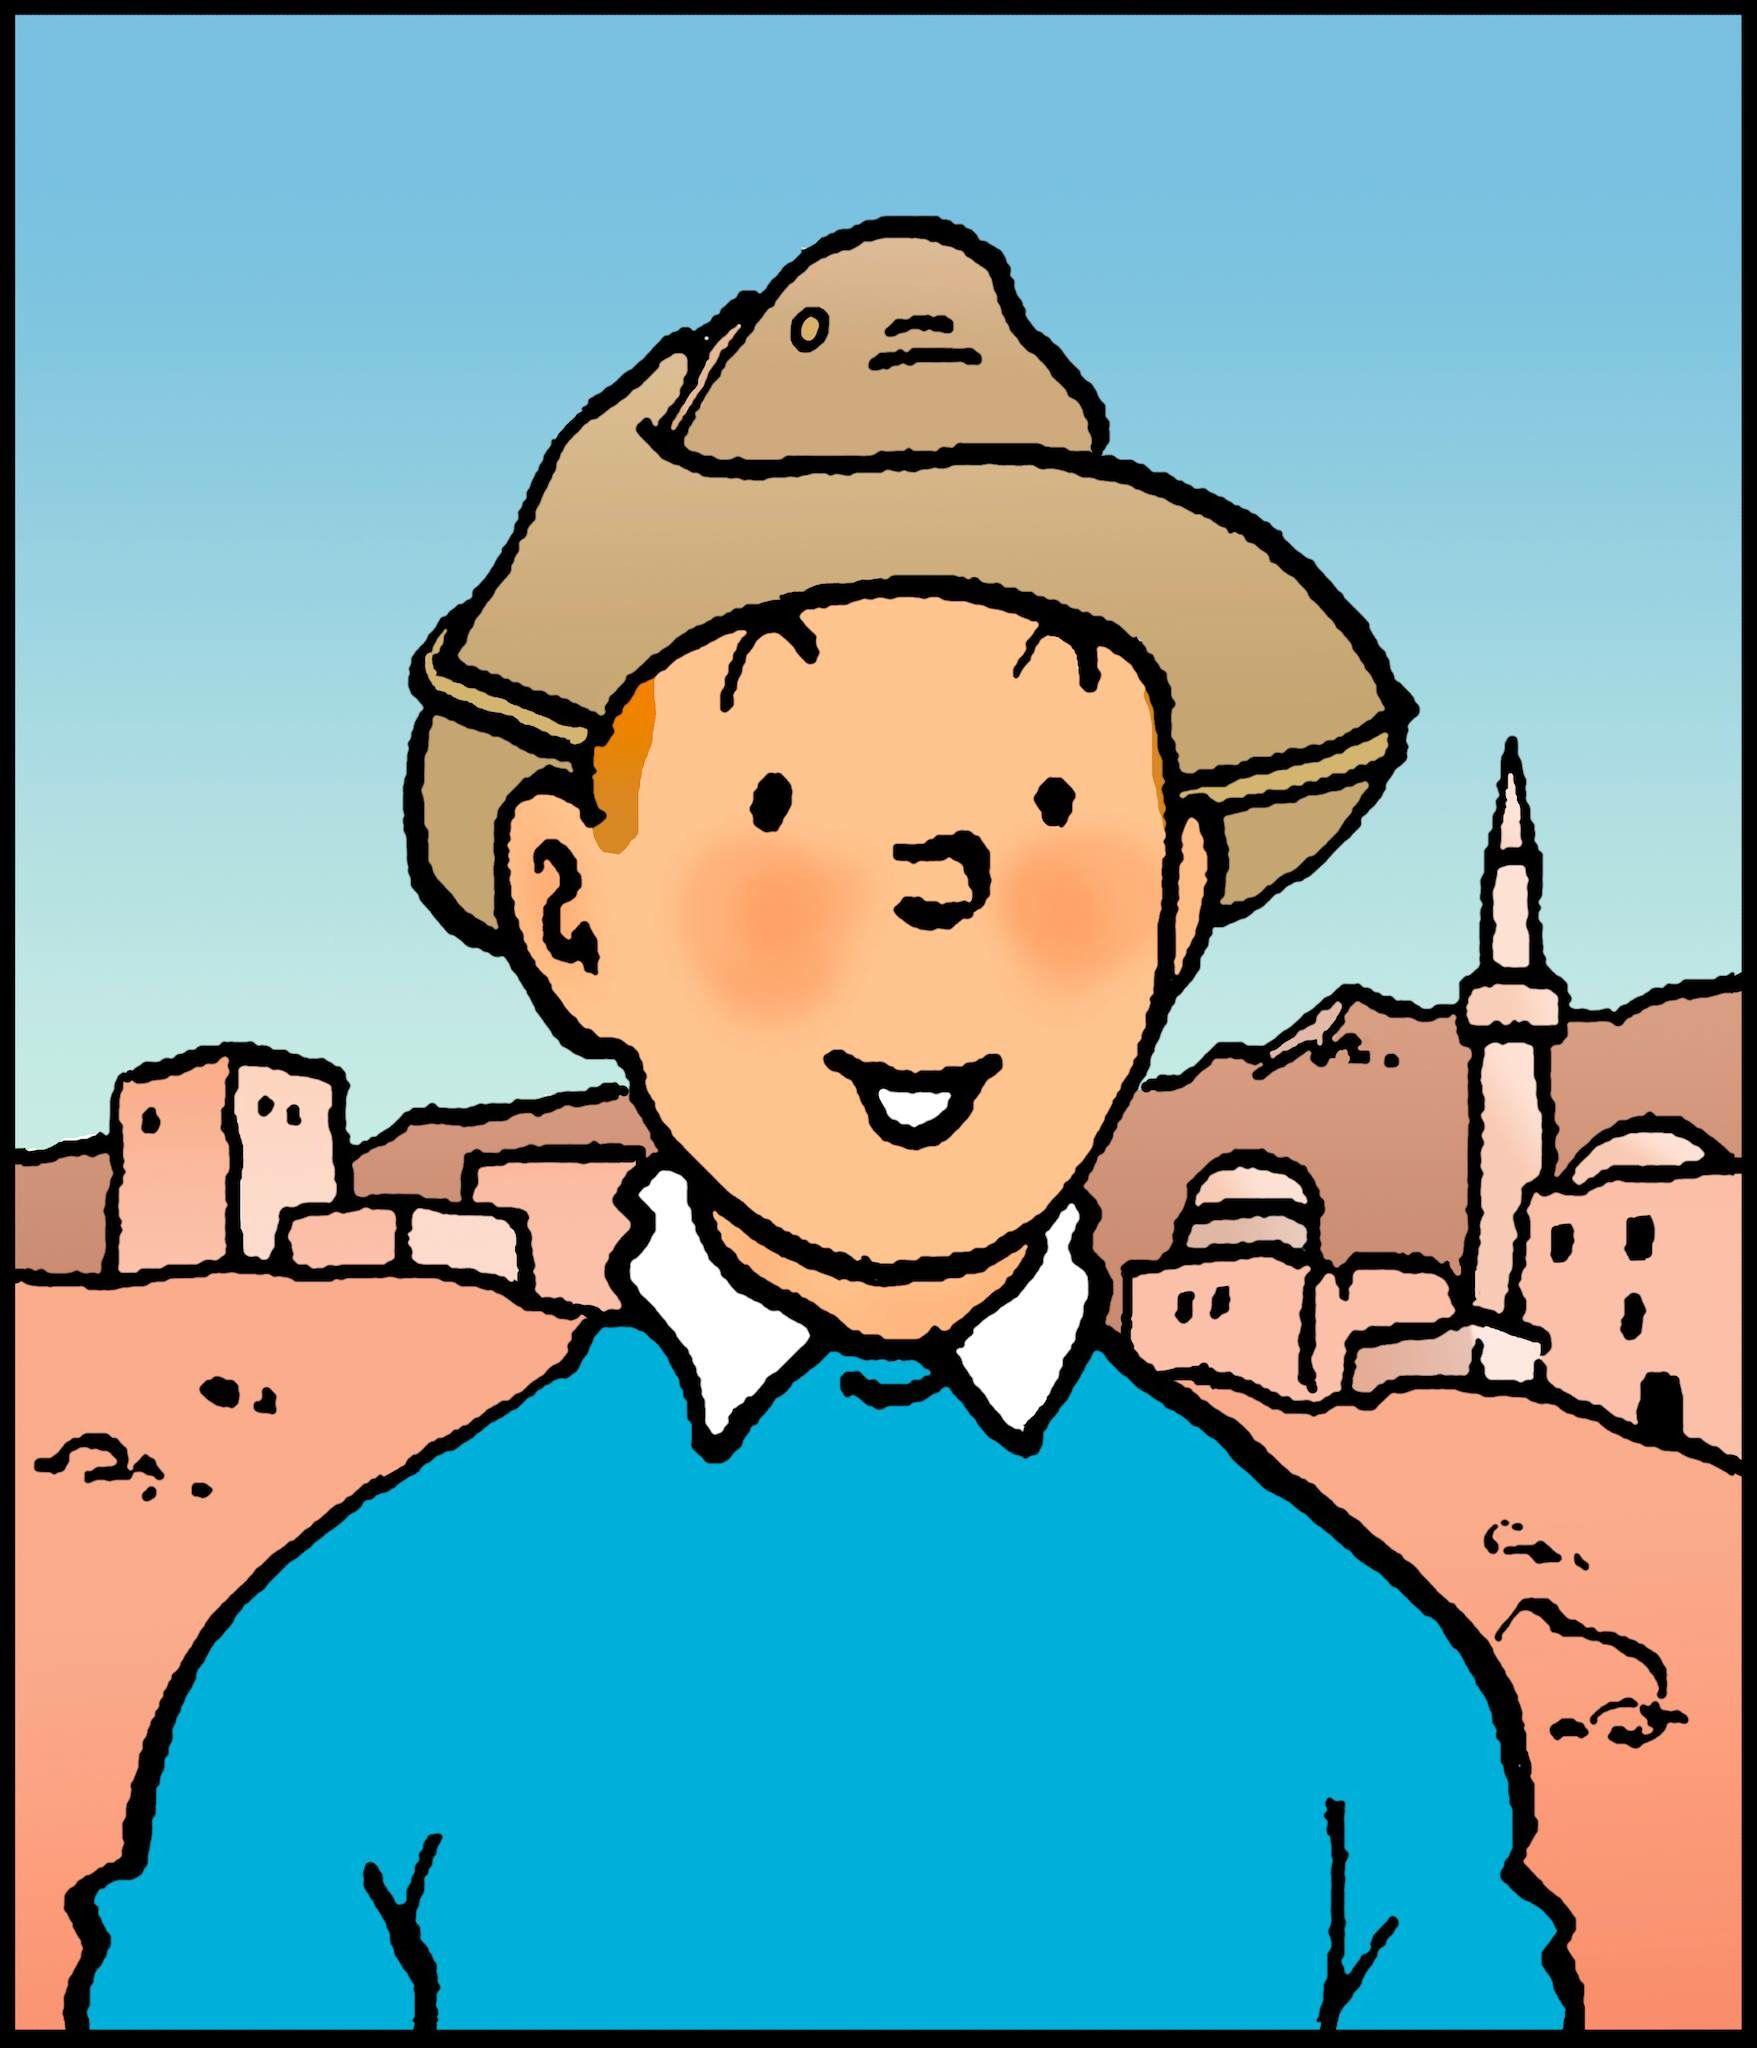 1957 Souvenir De Wadesdah Tintin In Wadesdah Dessin Realise Pour Les Pages De Garde Des Albums De Tintin Tintin Herge Bd Tintin Herge Tintin